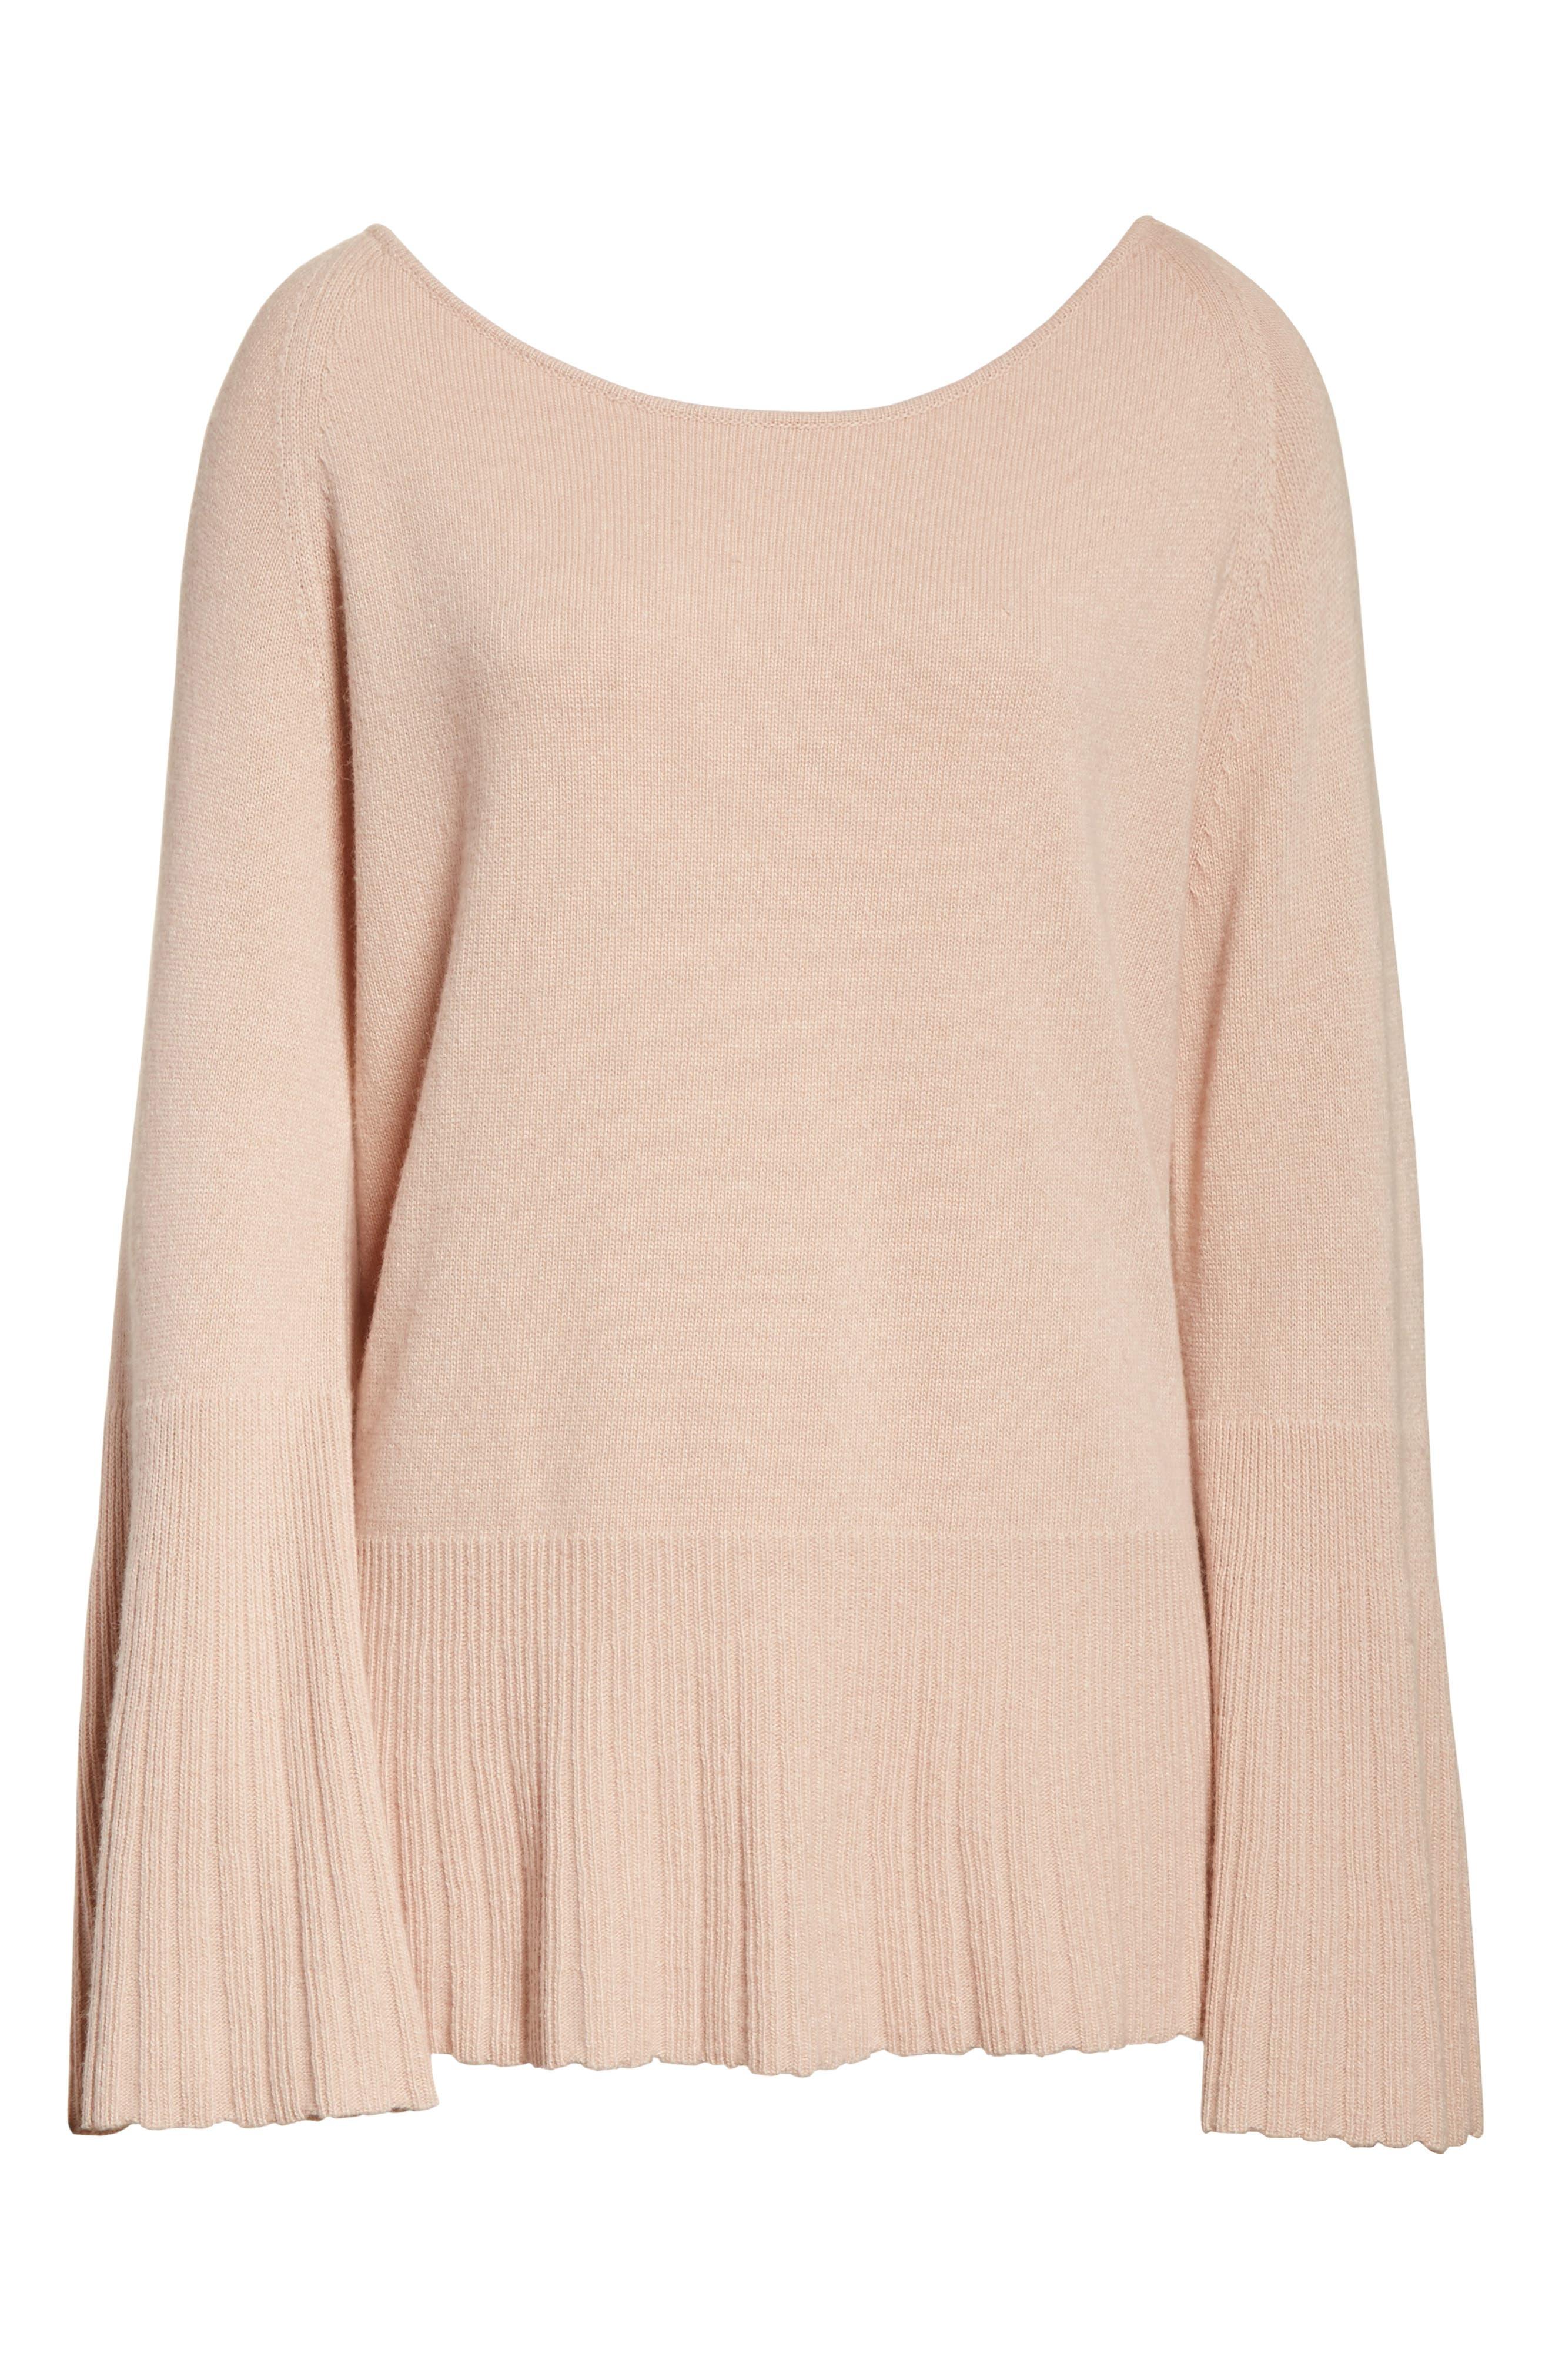 Clarette Bell Sleeve Sweater,                             Alternate thumbnail 6, color,                             650